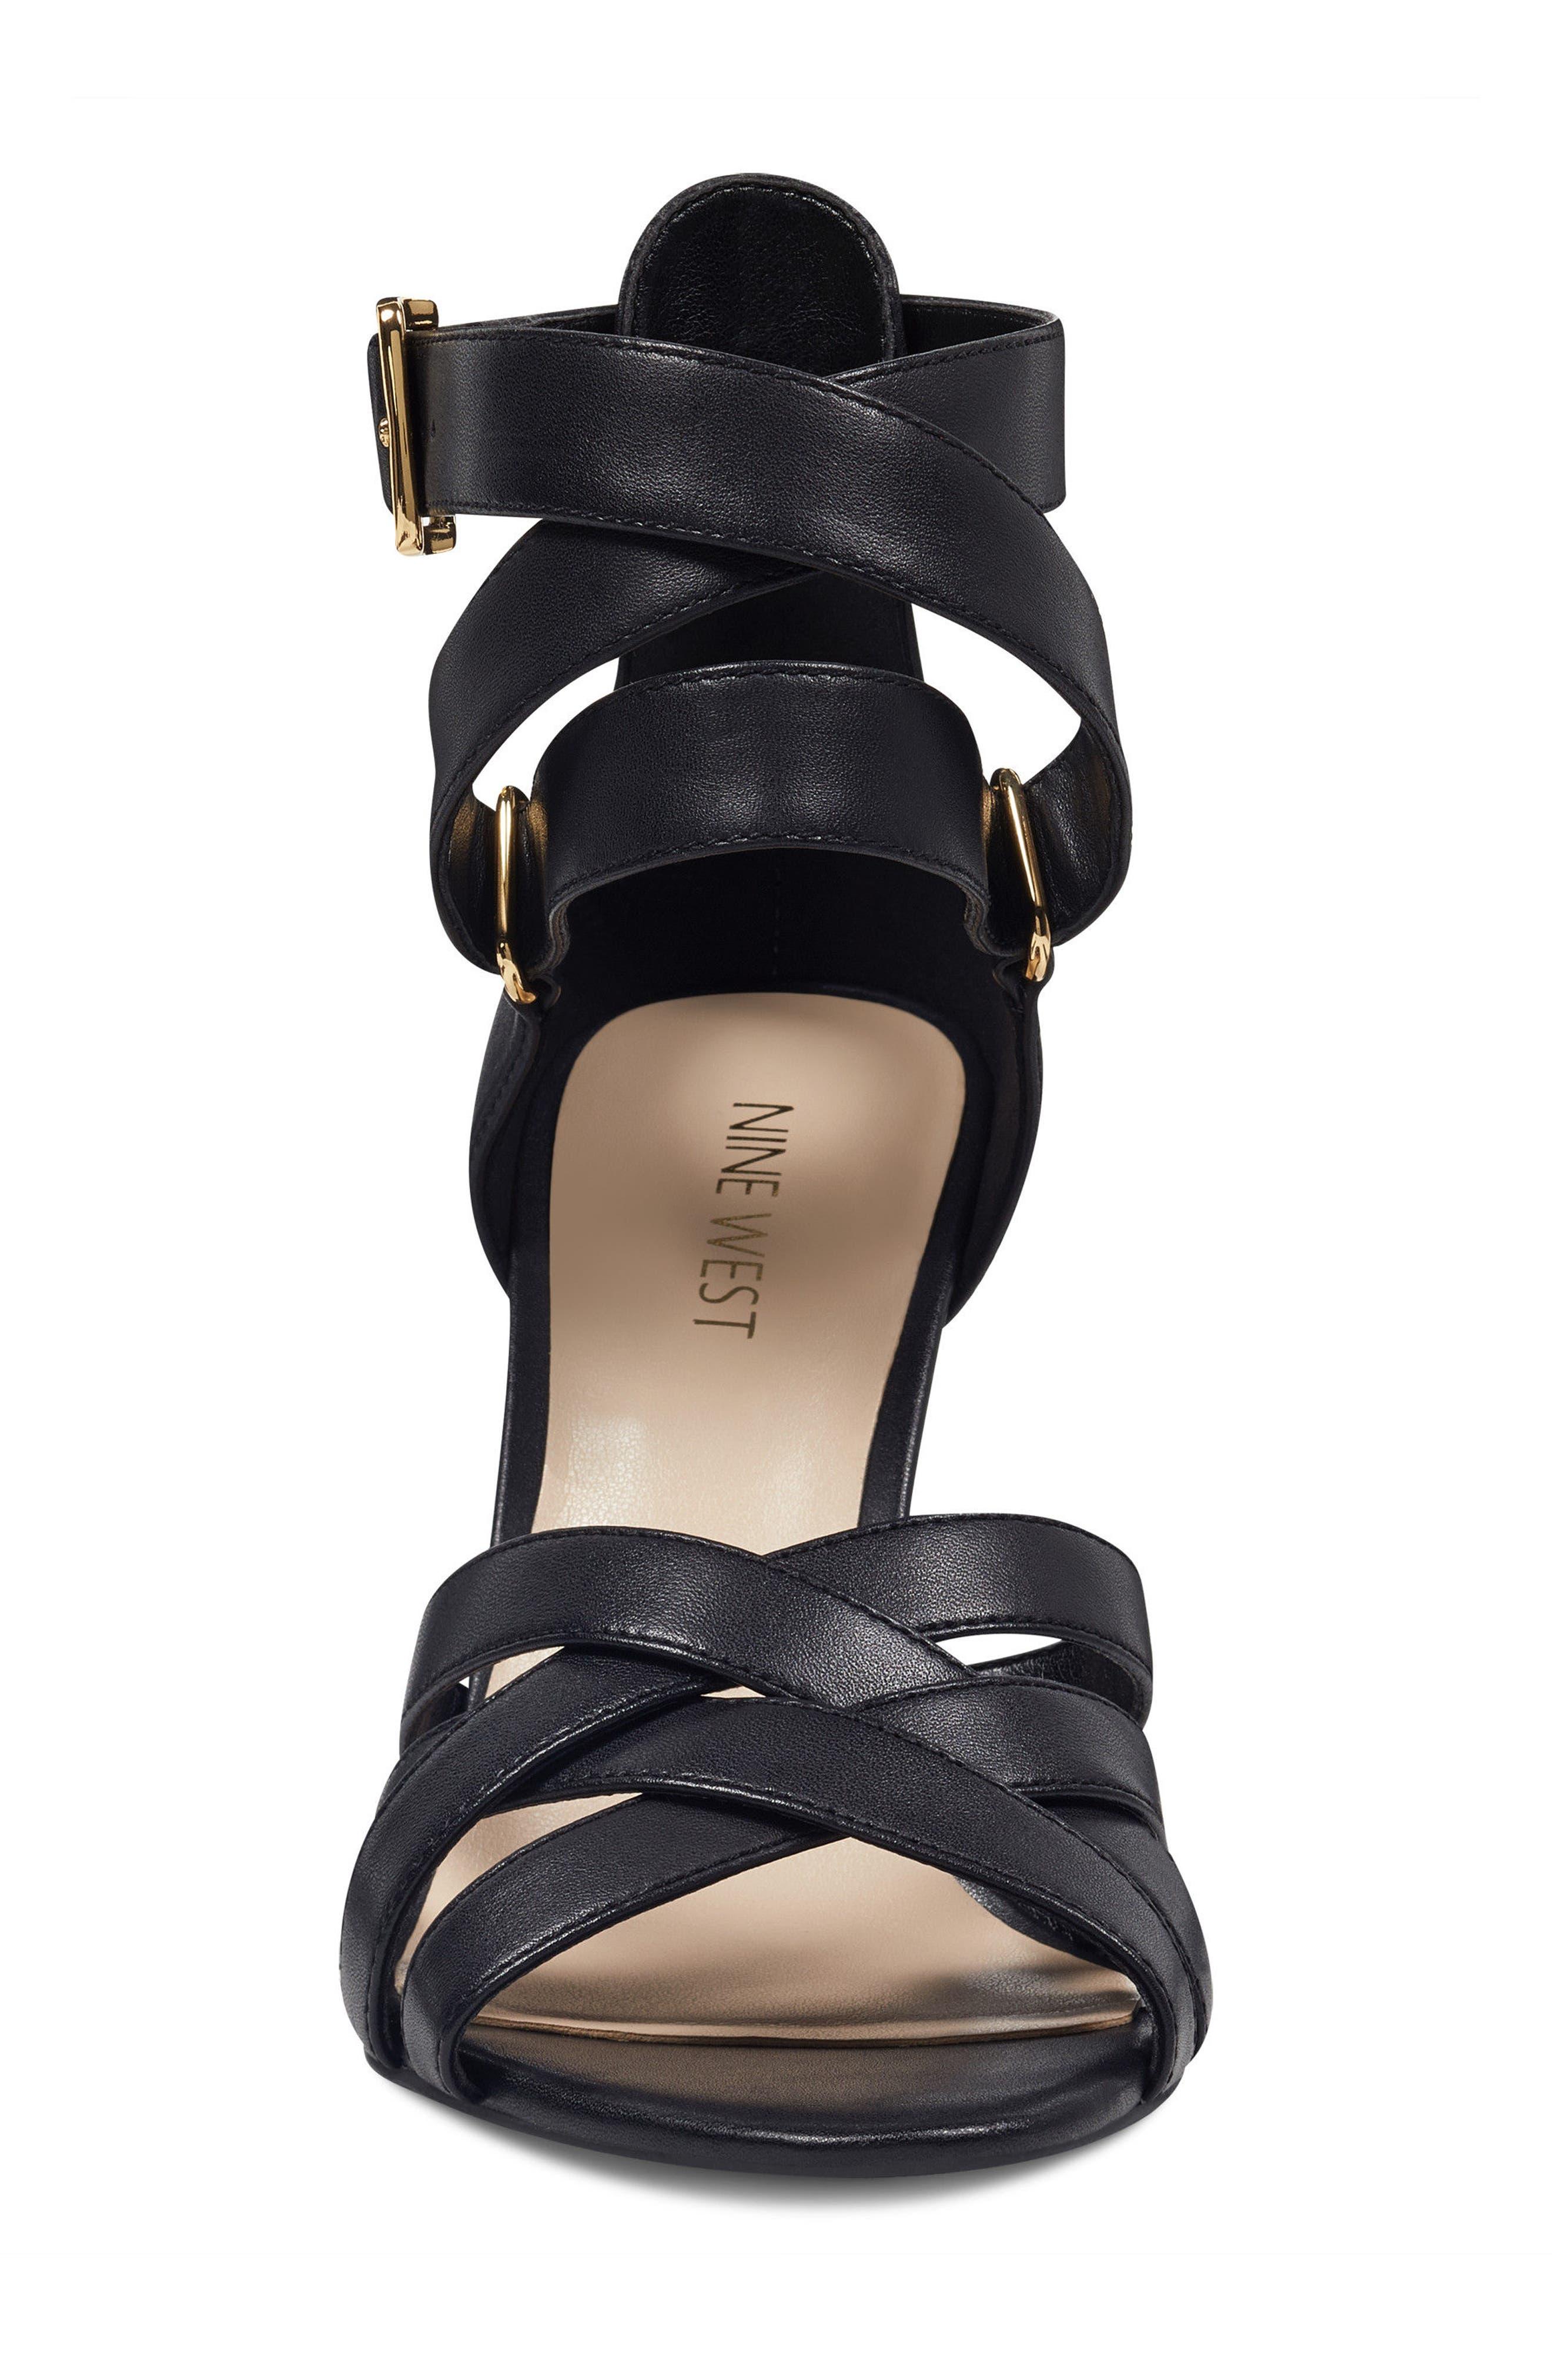 McGlynn Strappy Sandal,                             Alternate thumbnail 4, color,                             Black Leather